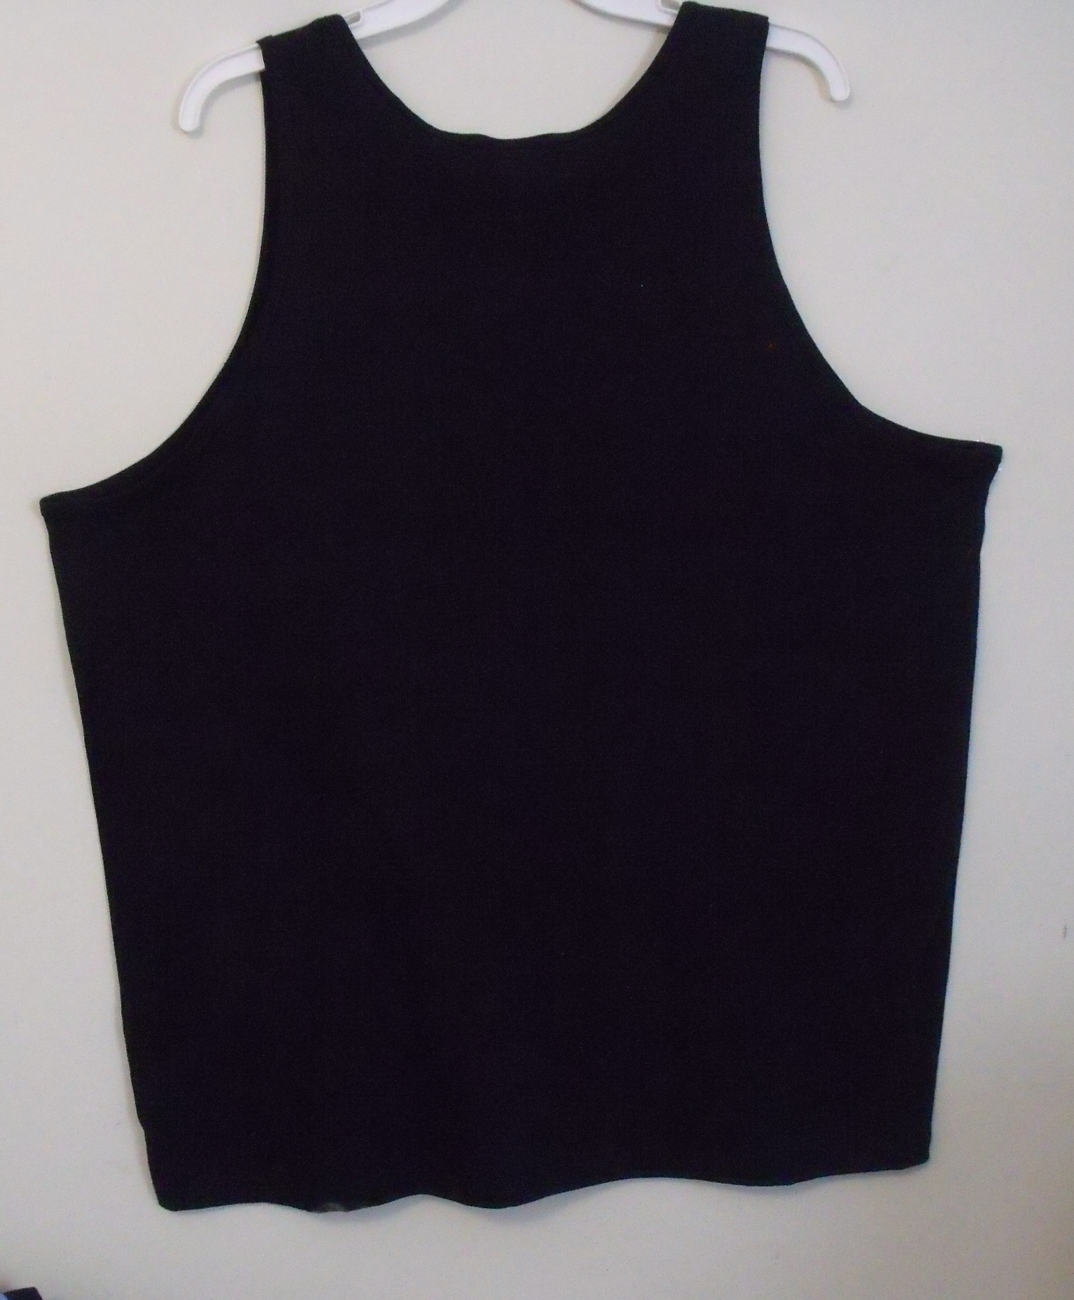 Mens Gildan Black NWOT Sleeveless Tank Top Size 2XL